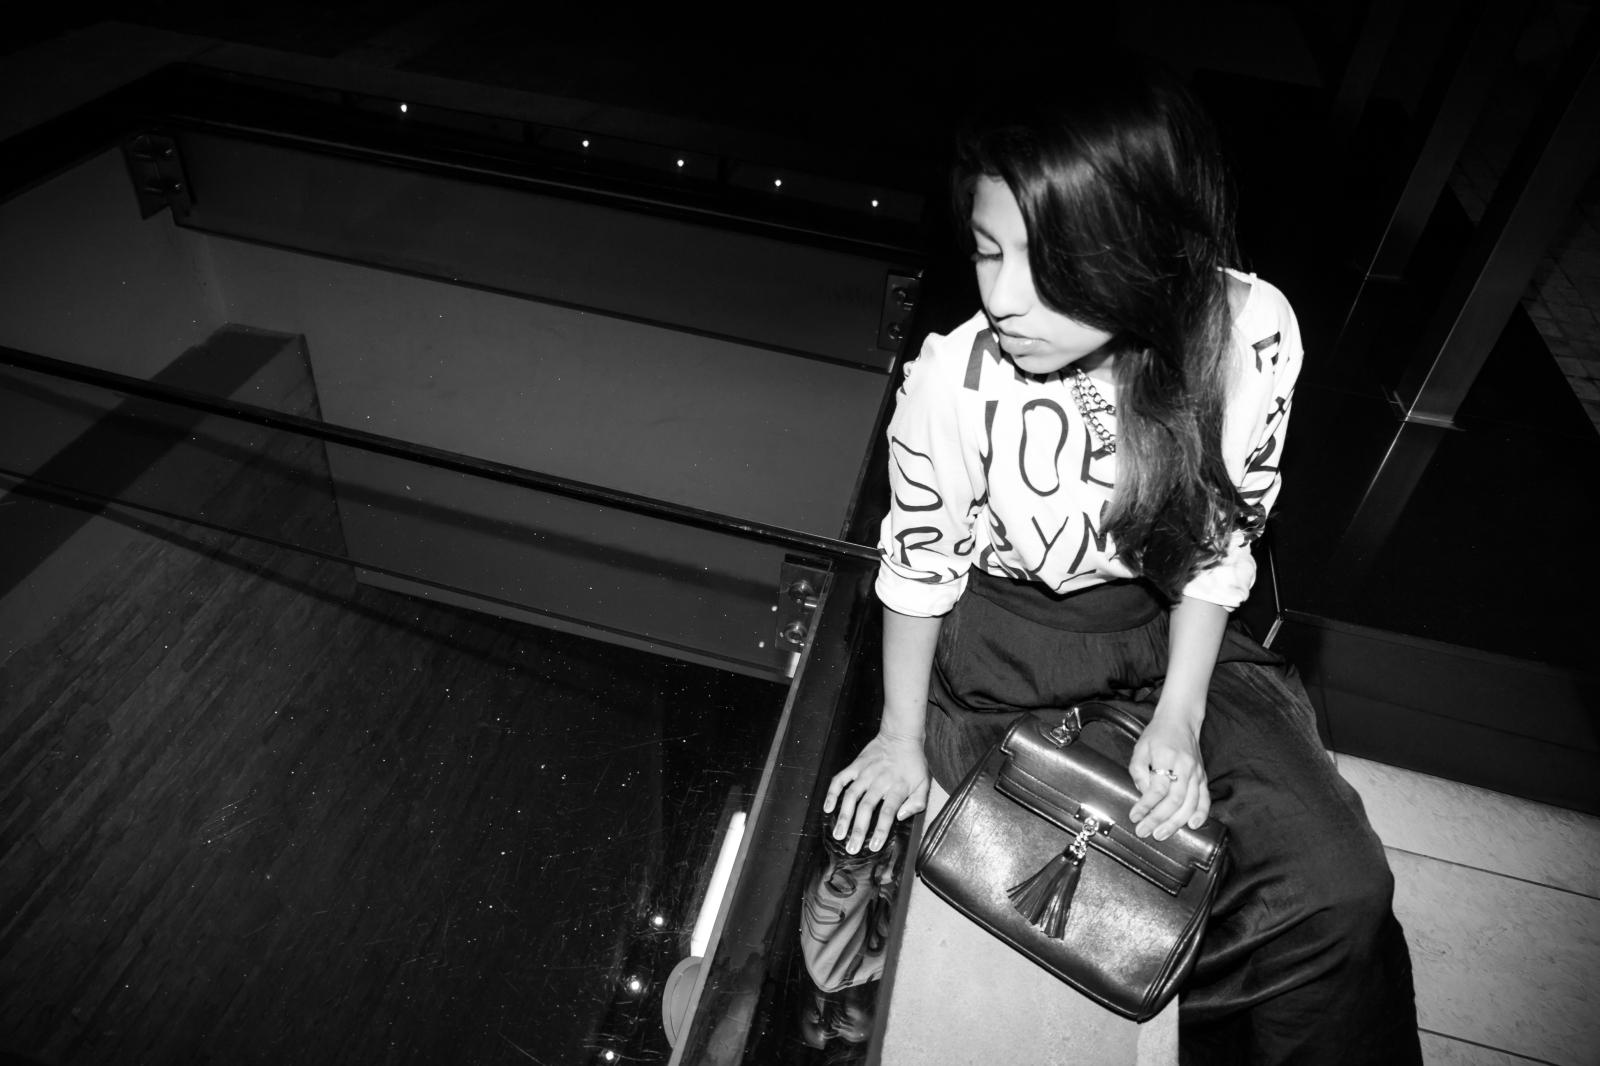 Monochrome, black and white, fall SA Fashion Blogger Lookbook 2013